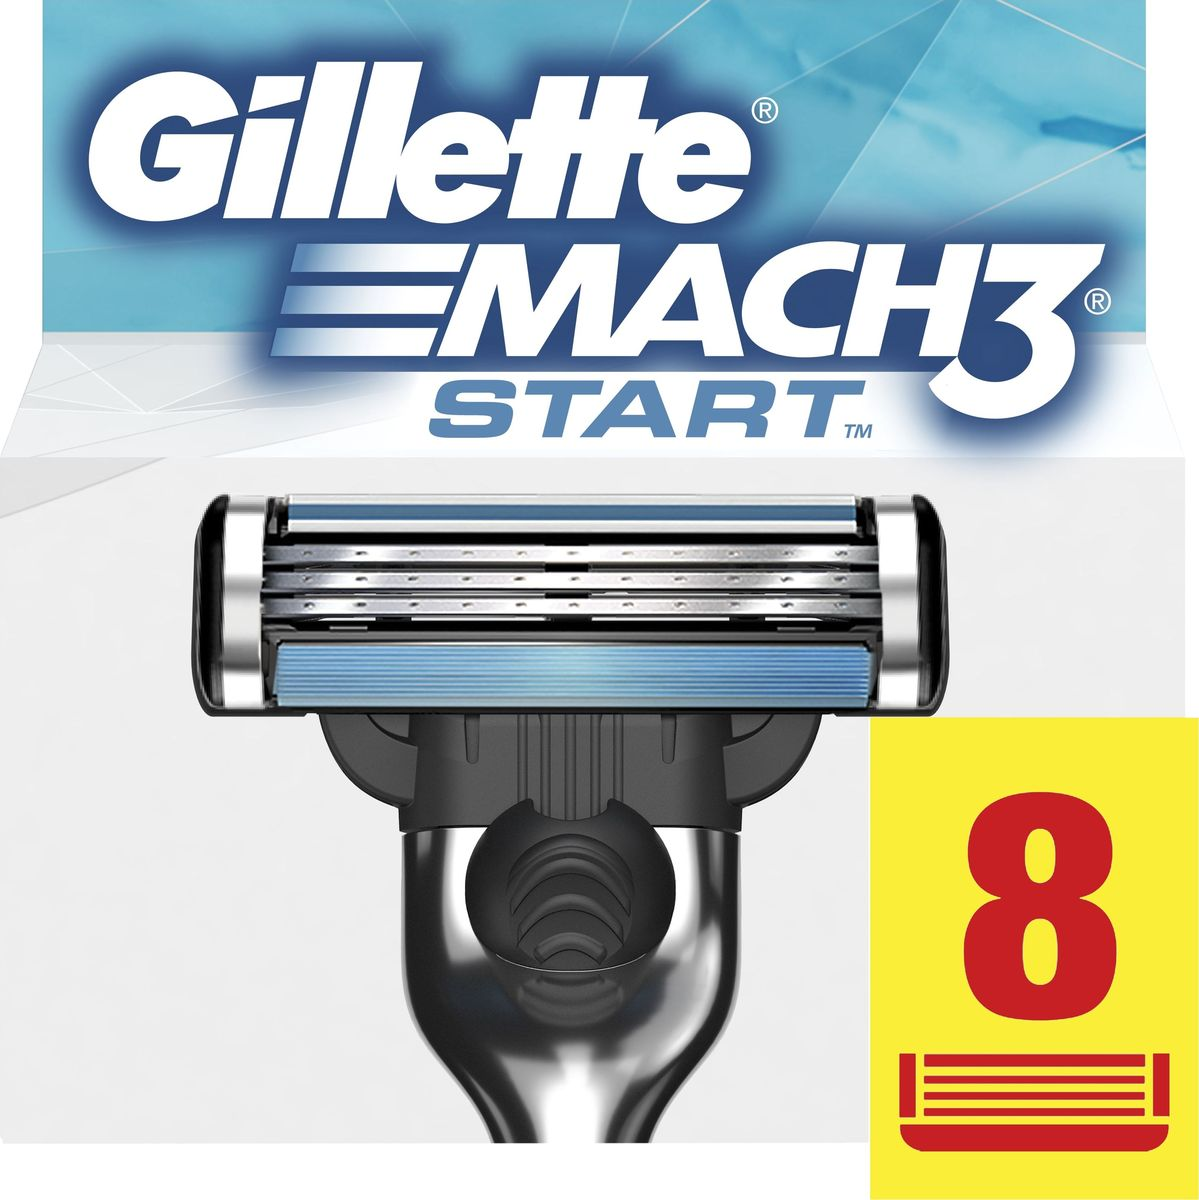 Gillette Mach3 Start Сменные Кассеты Для Бритвы, 8 шт